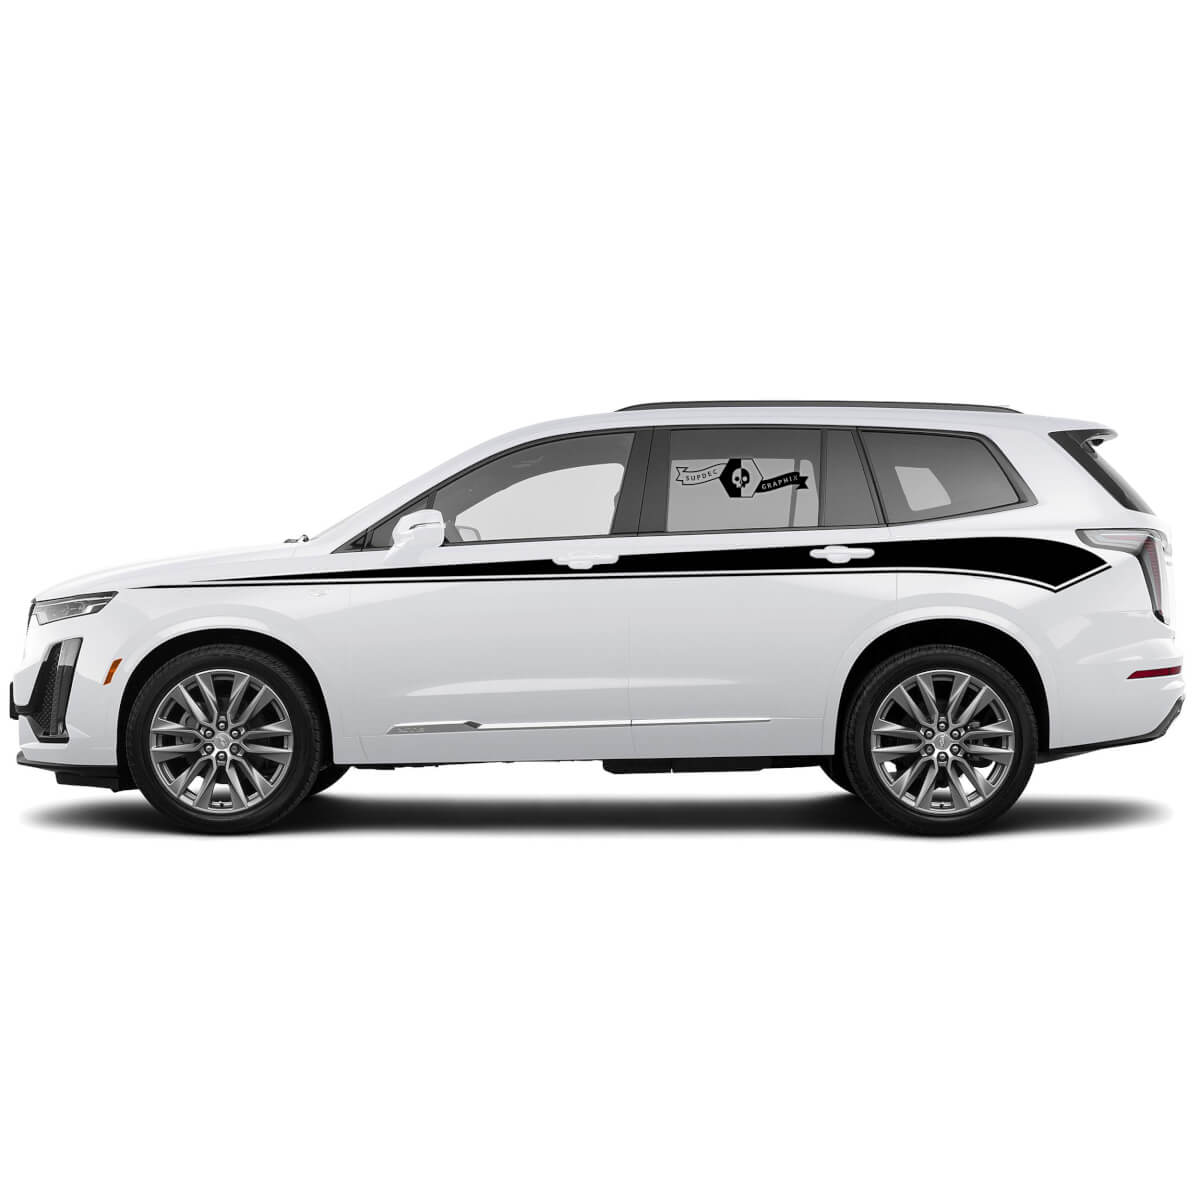 2021 CADILLAC XT6 SEITE STRIPE SUV Vinyl Aufkleber Aufkleber